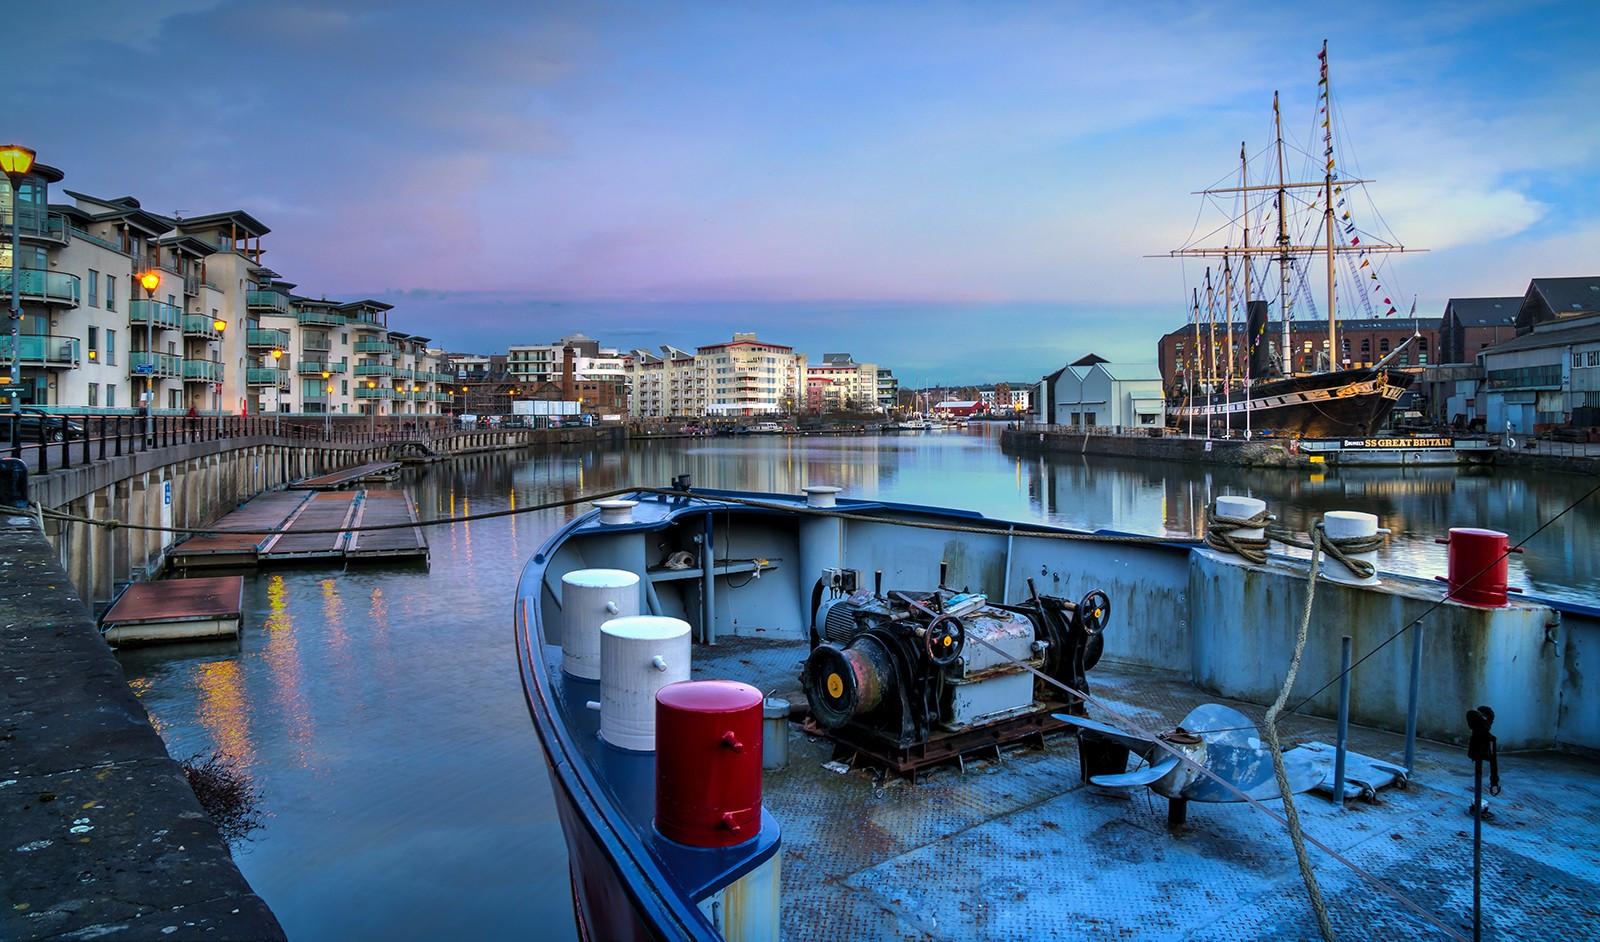 Evening Light on Bristol Waterfront